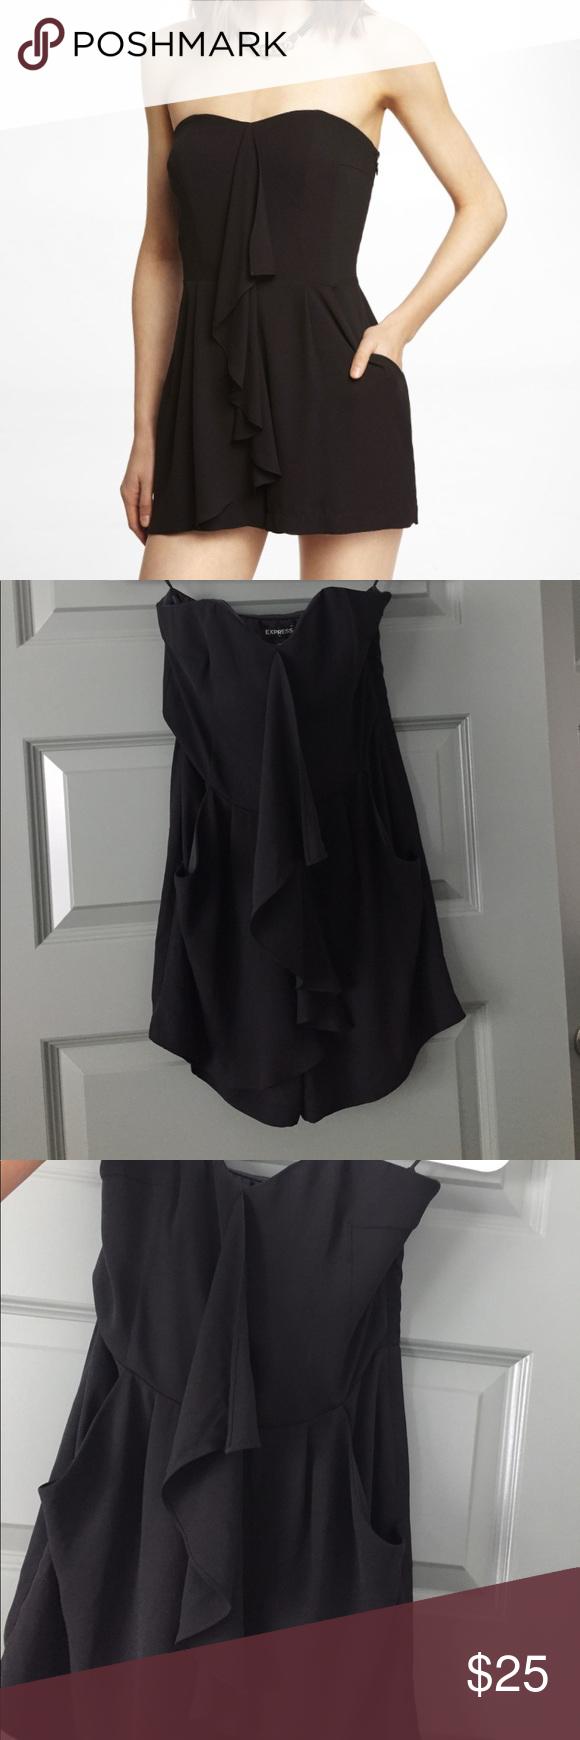 5713e881a98e Express - Black Ruffle Romper Flirty black romper wth side zipper and  pockets. Brand New